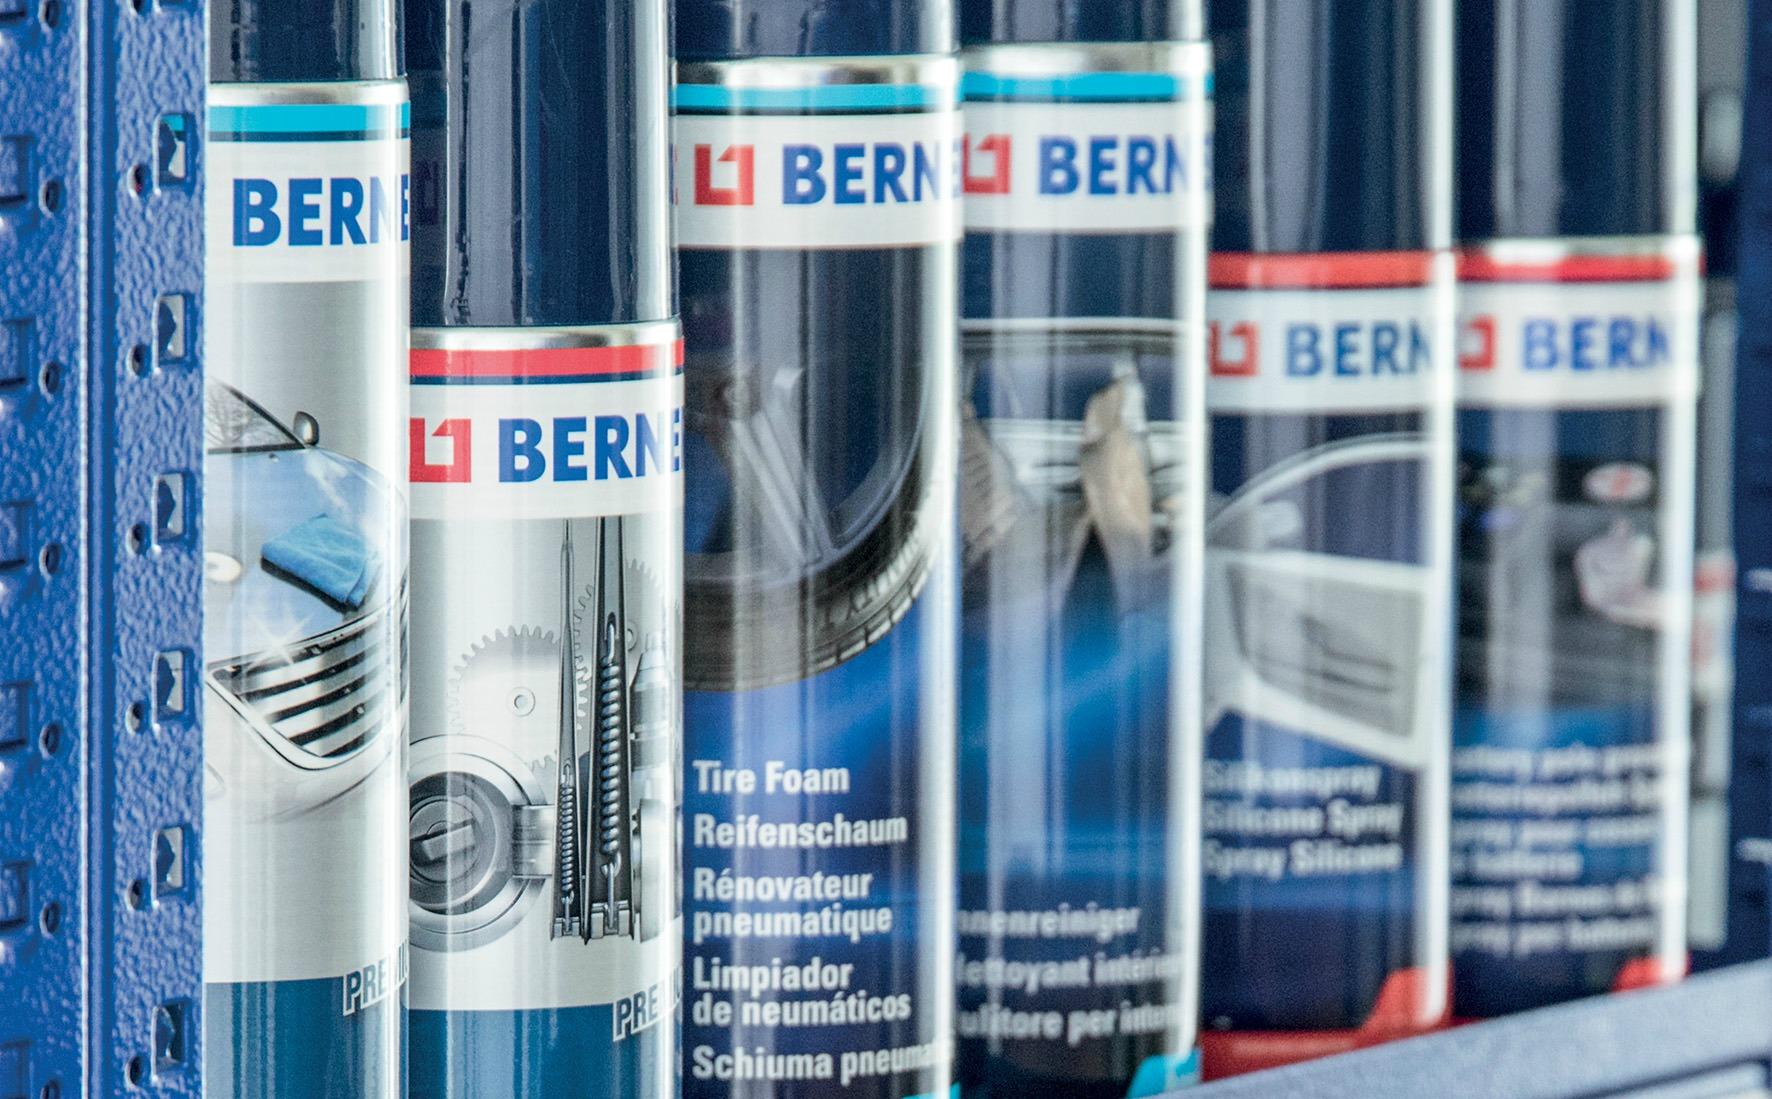 prodotti chimici Berner